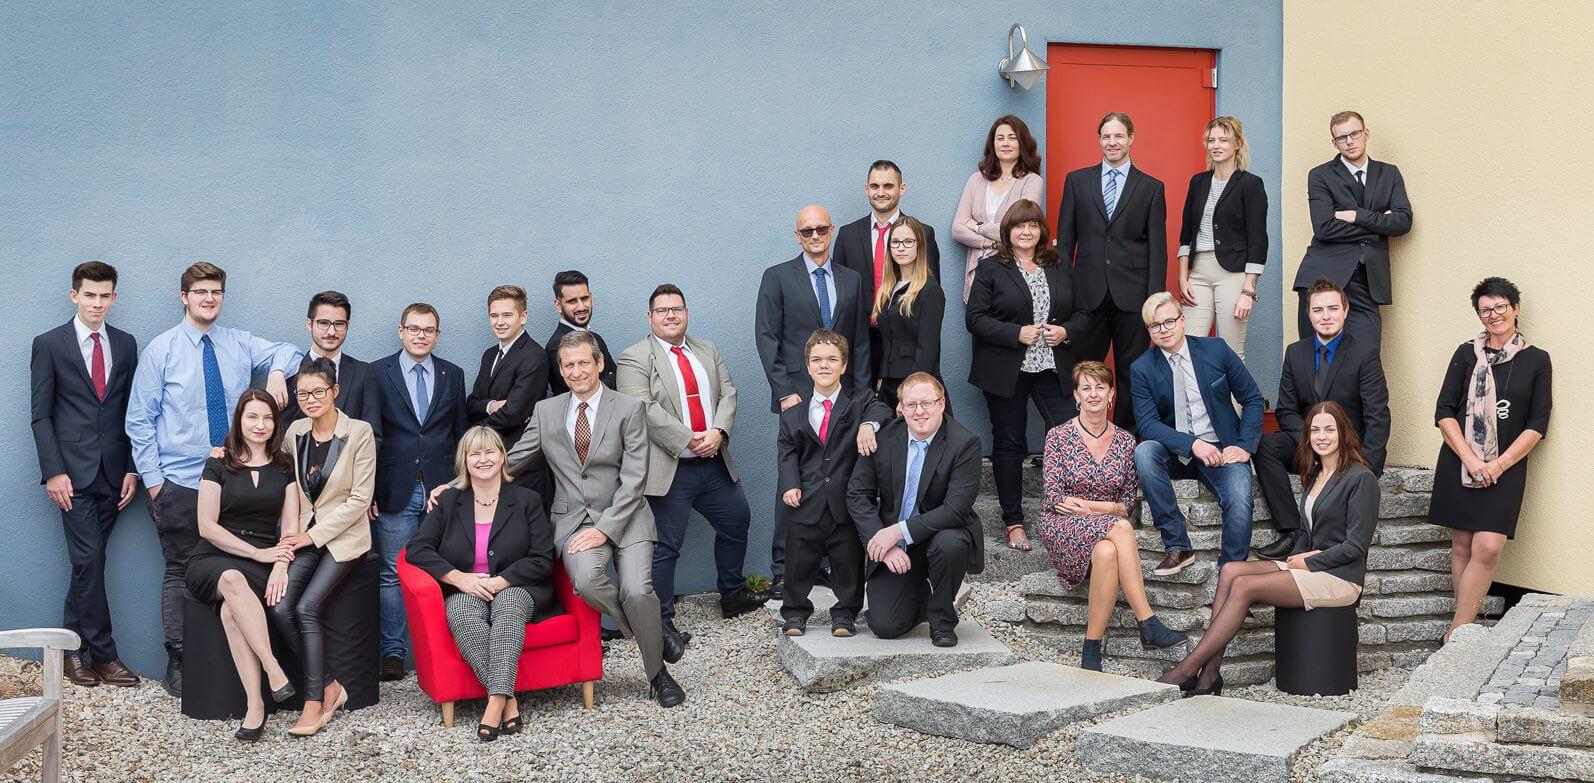 RapidMax Speichersdorf das Team